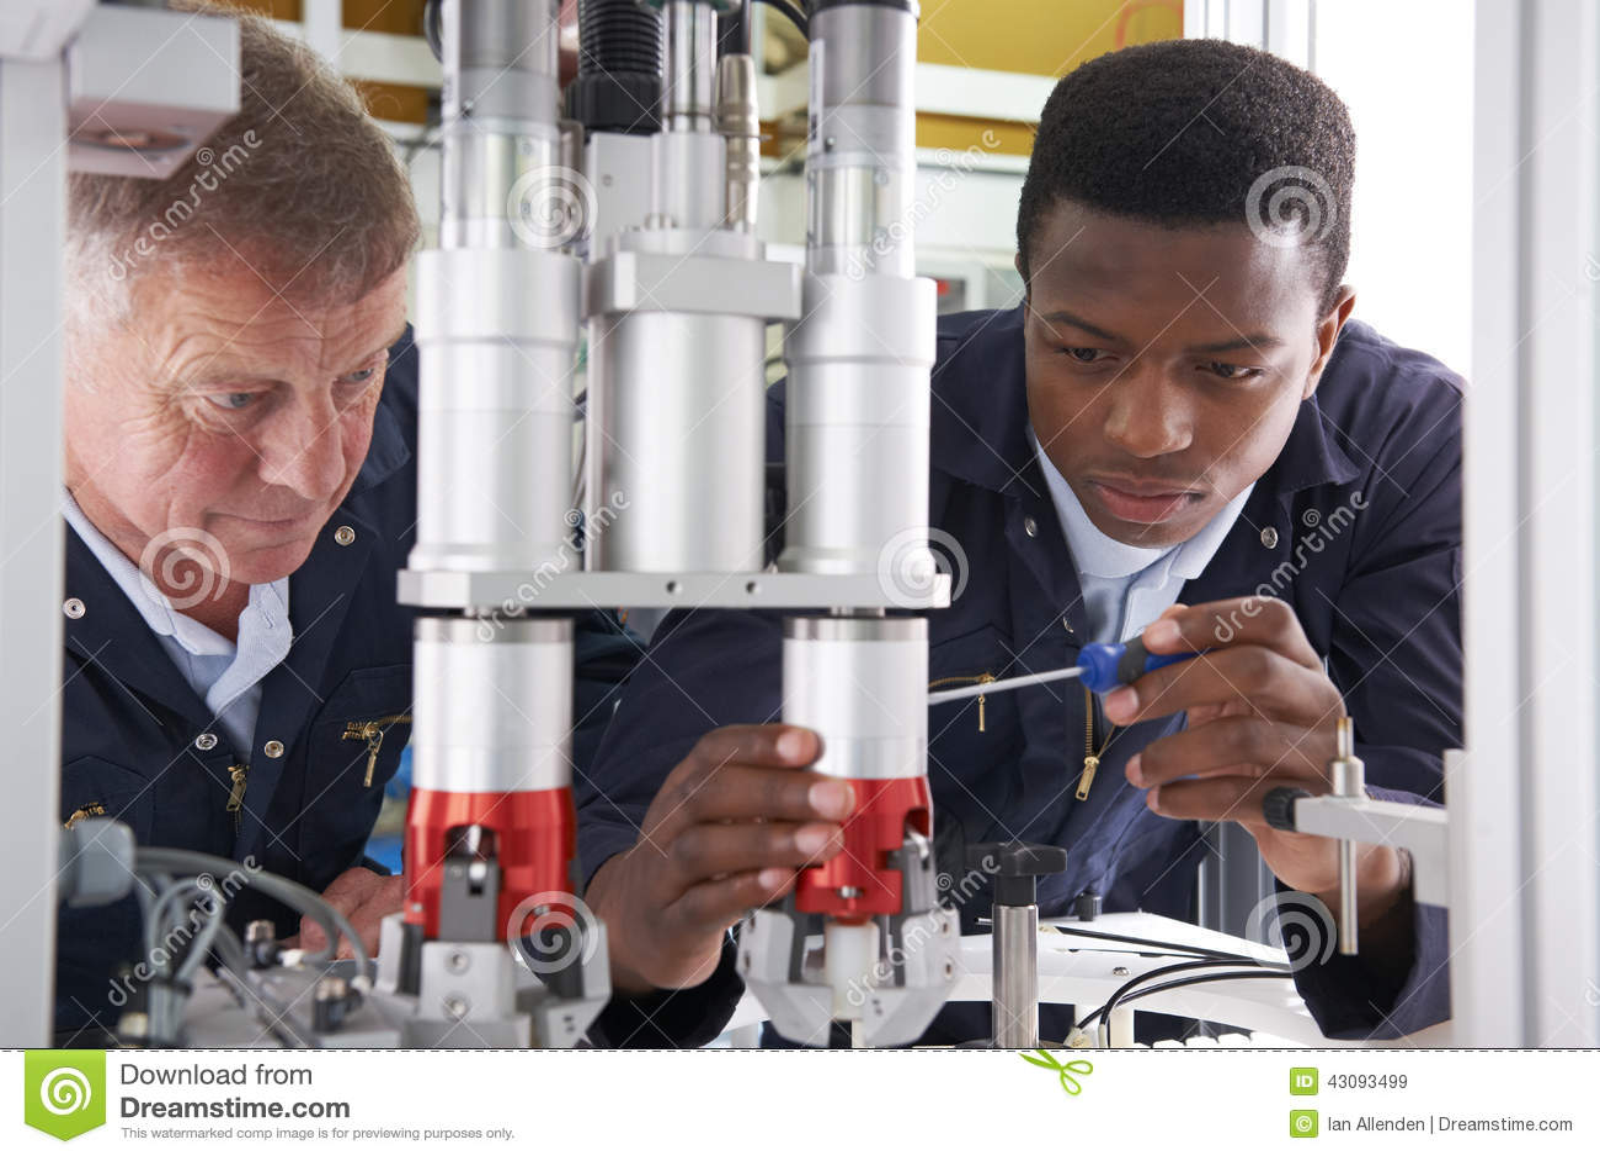 Coordenador And Apprentice Working na máquina na fábrica